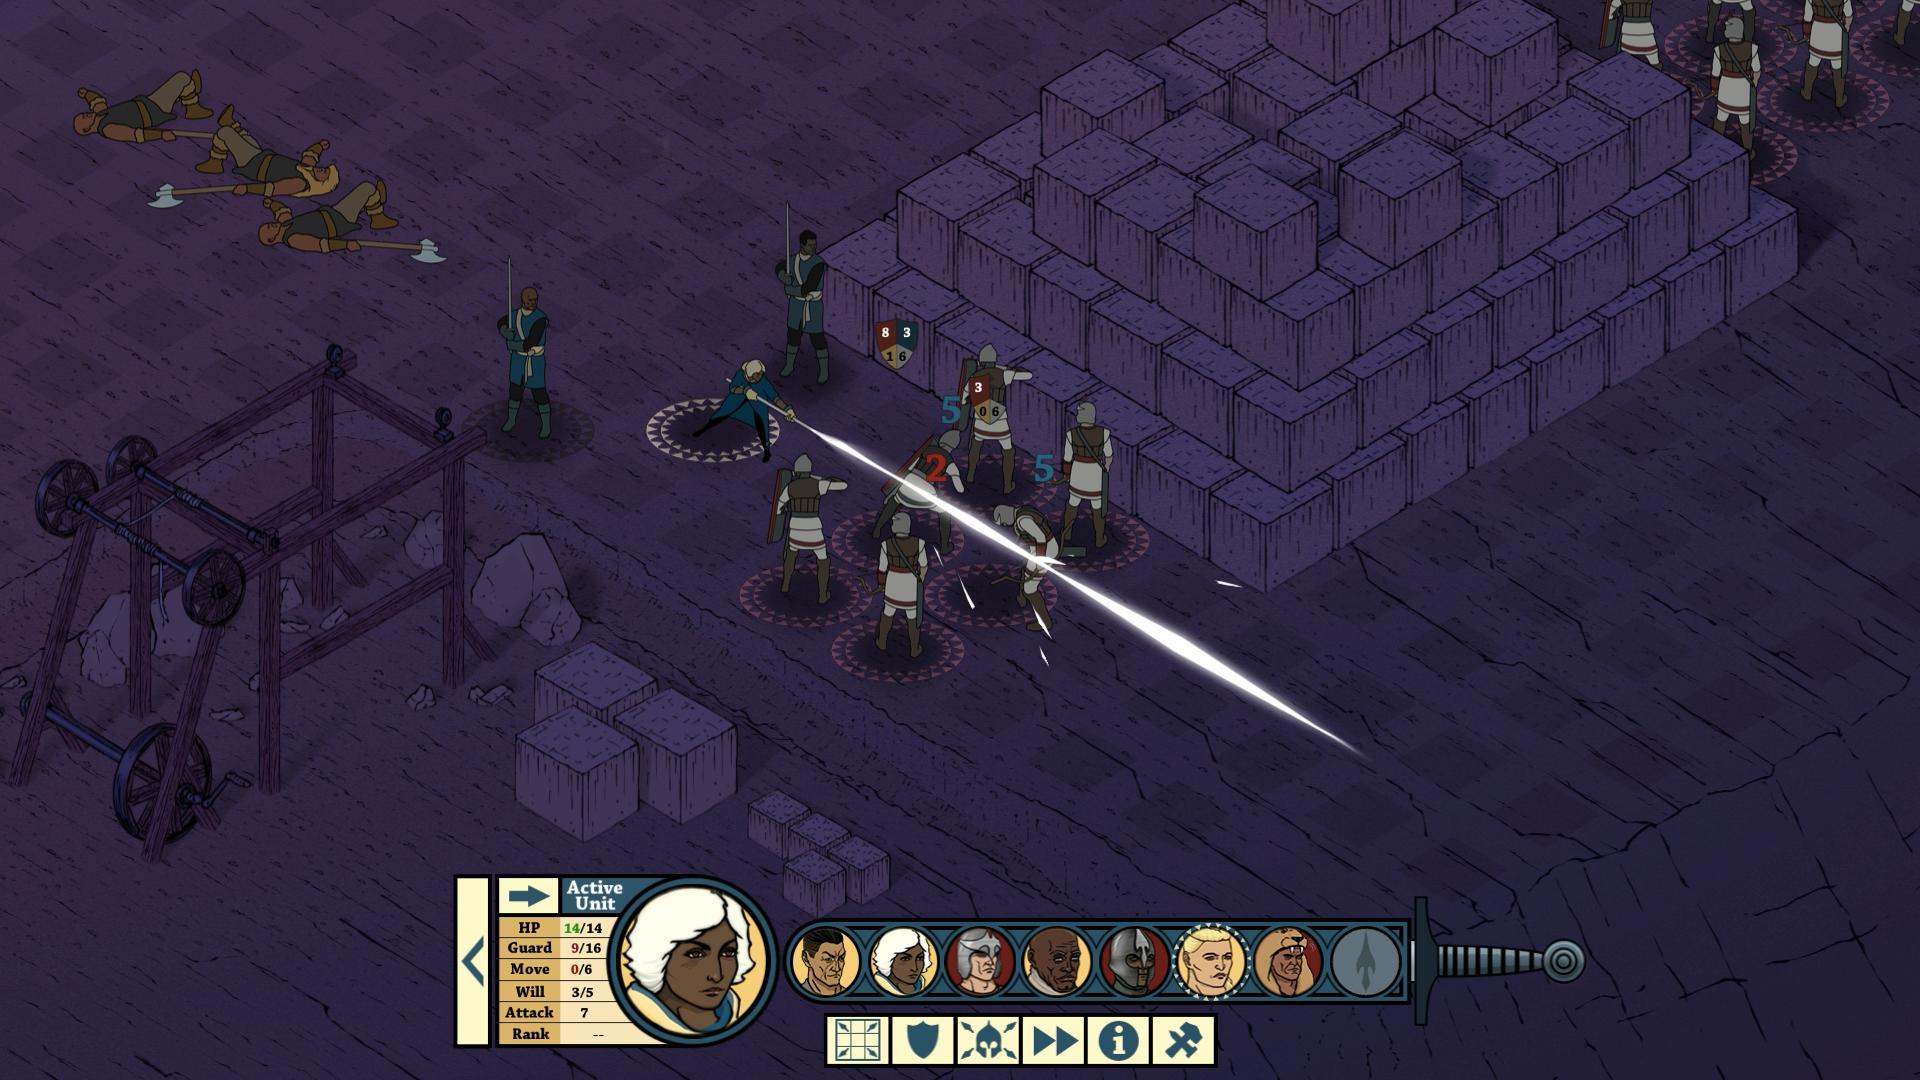 Tactical RPG